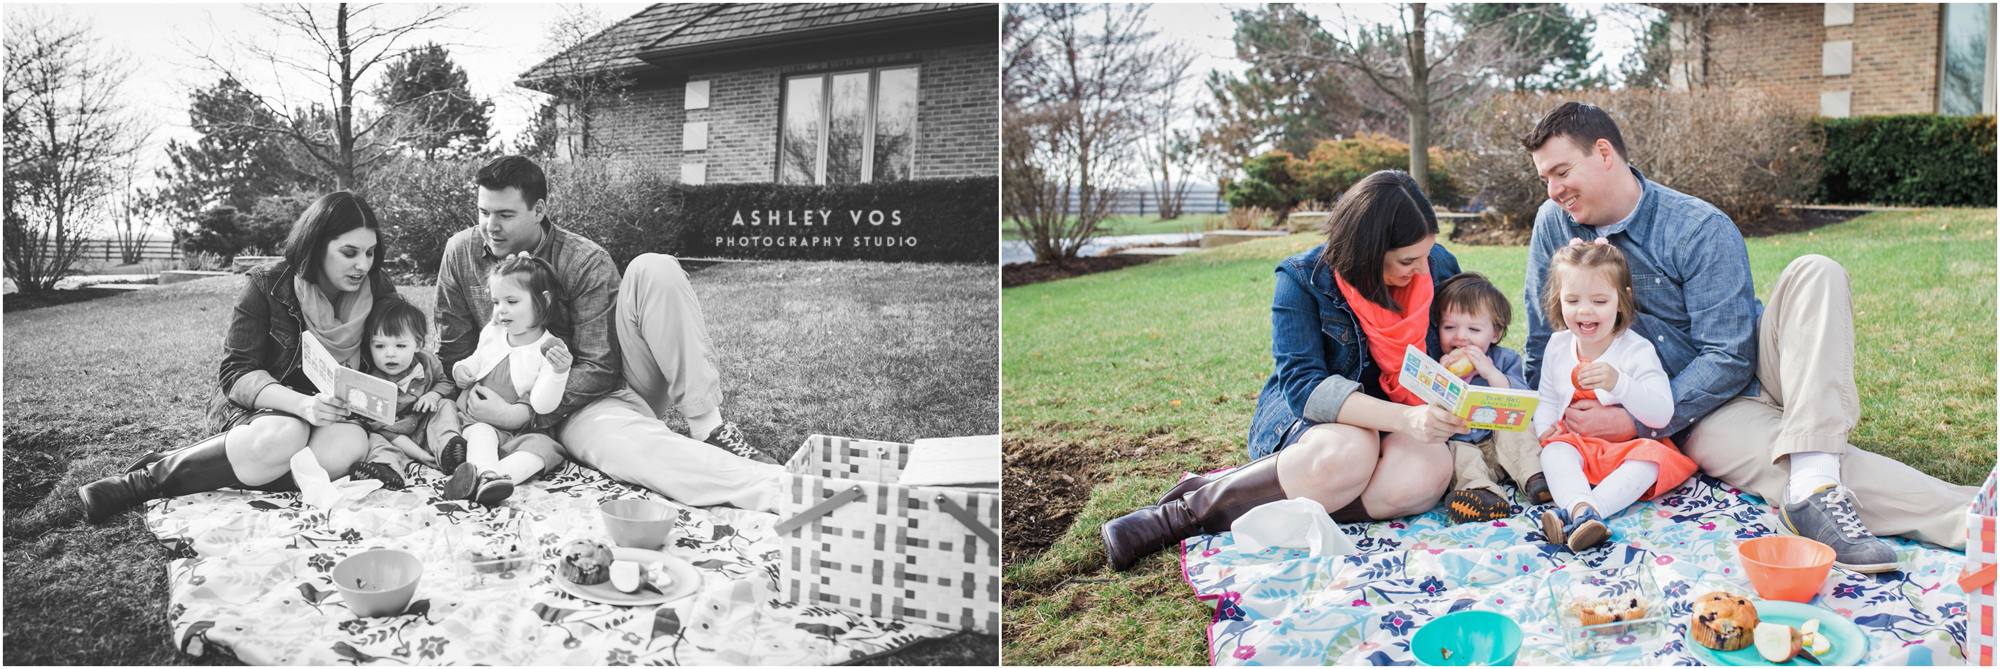 Ashley Vos Photography Seattle Lifestyle Family Photography_0038.jpg